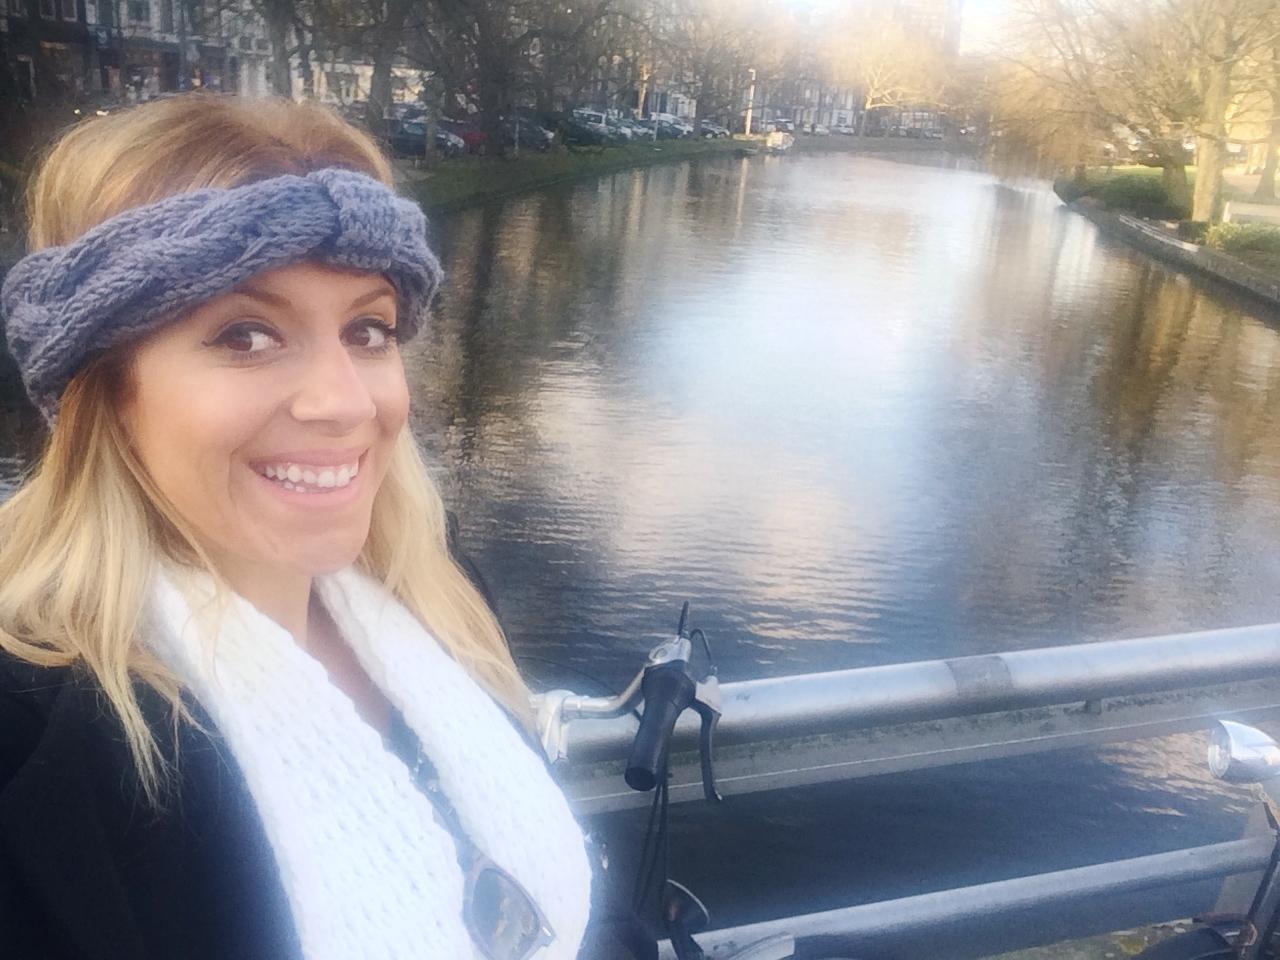 hofit kim cohen in Amsterdam